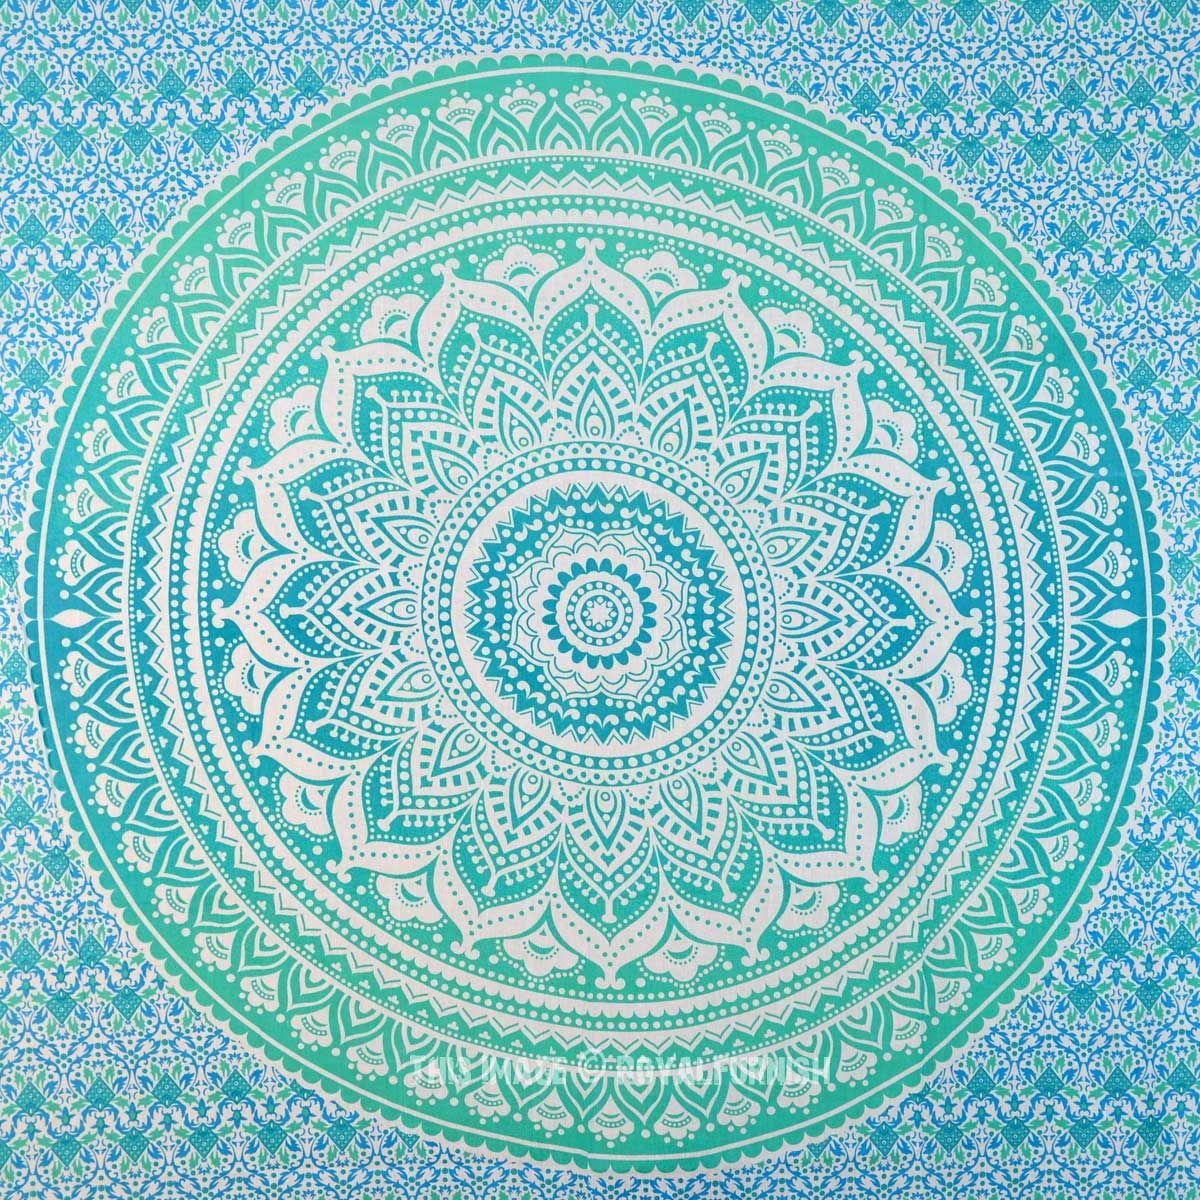 Blue multi elephants sun ombre mandala wall tapestry royalfurnish - Small Green Floral Circle Ombre Wall Tapestry Mandala Hippie Tapestry On Royalfurnish Com